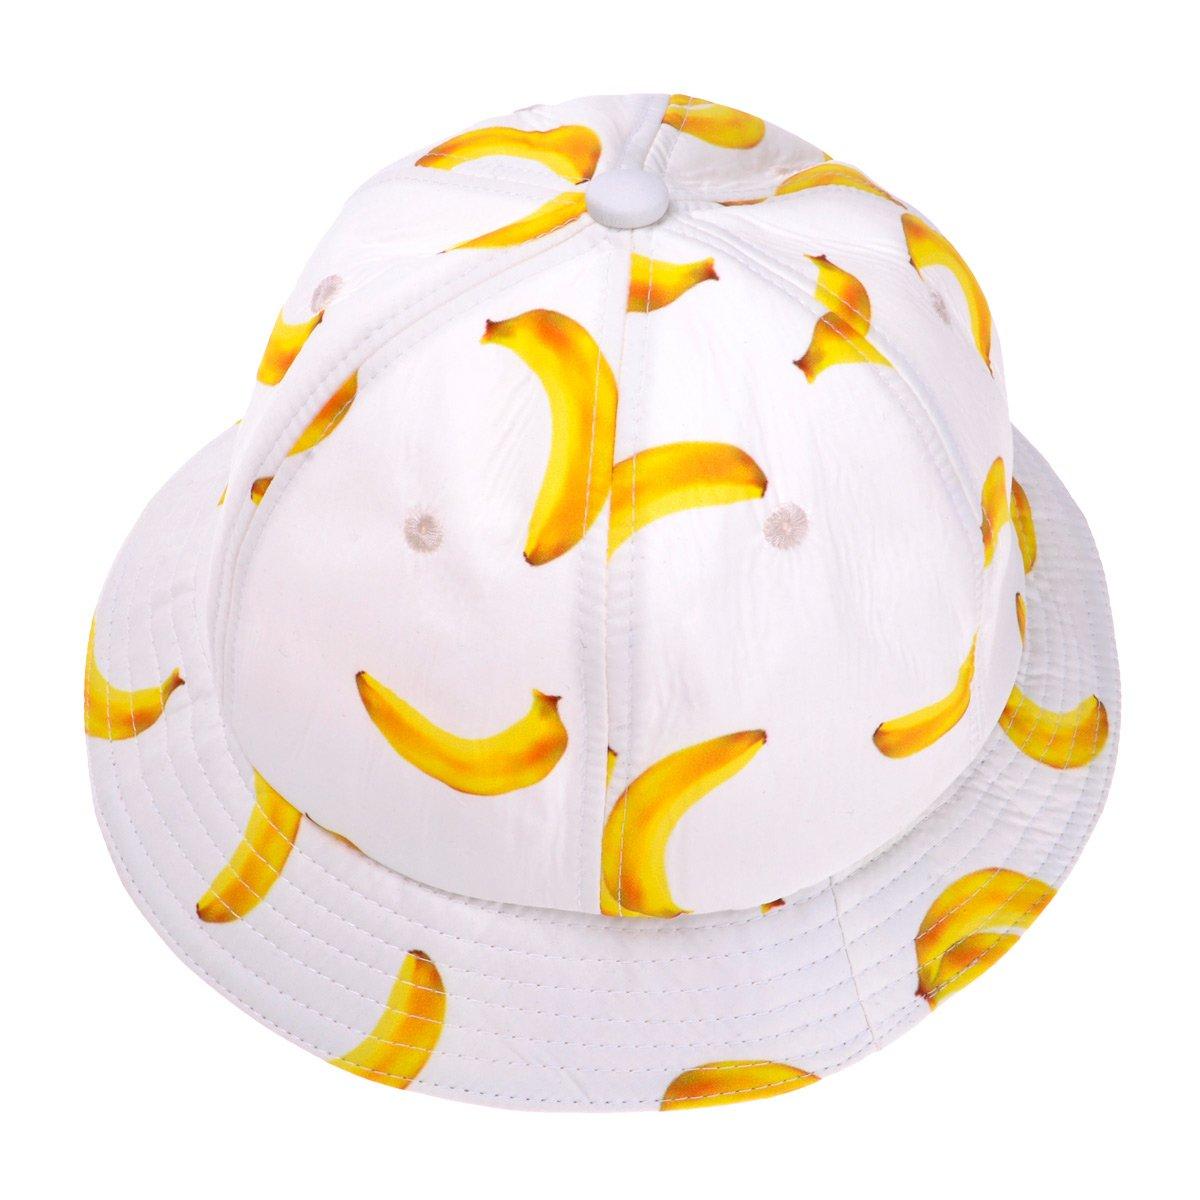 ZLYC Unisex Funky Fruit Print Bucket Hat Fishmen Outdoor Cap ZYJ-MZ-061-BK-1